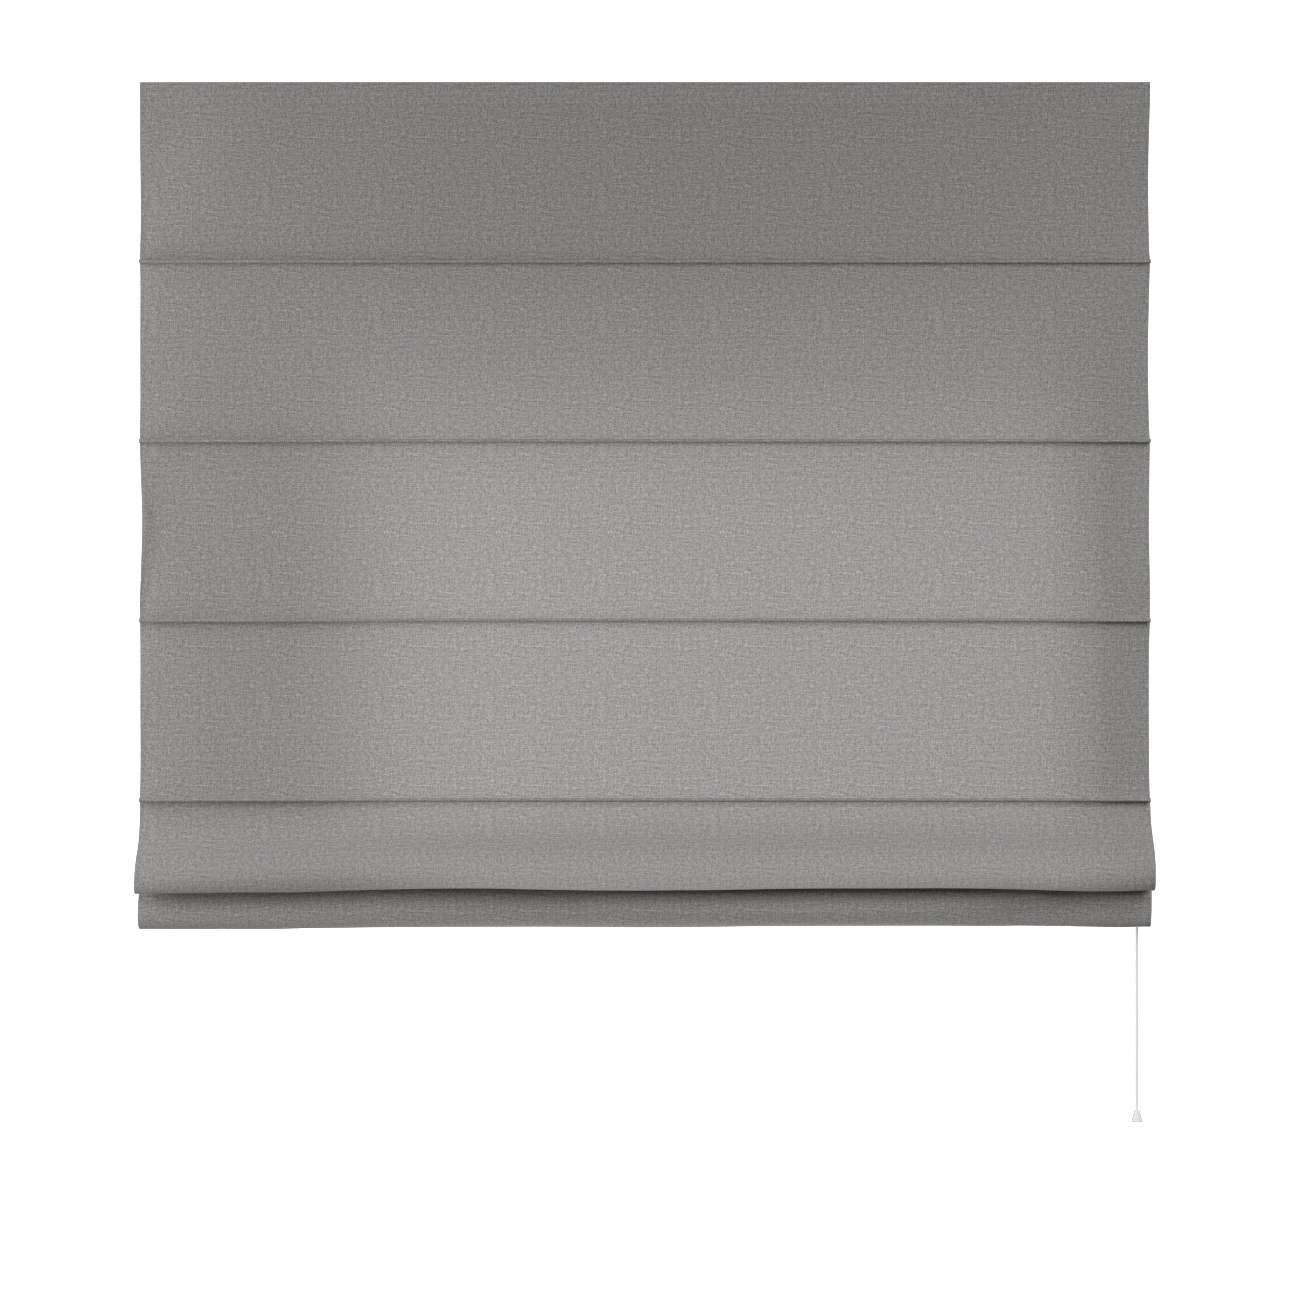 Capri roman blind 80 x 170 cm (31.5 x 67 inch) in collection Edinburgh , fabric: 115-81